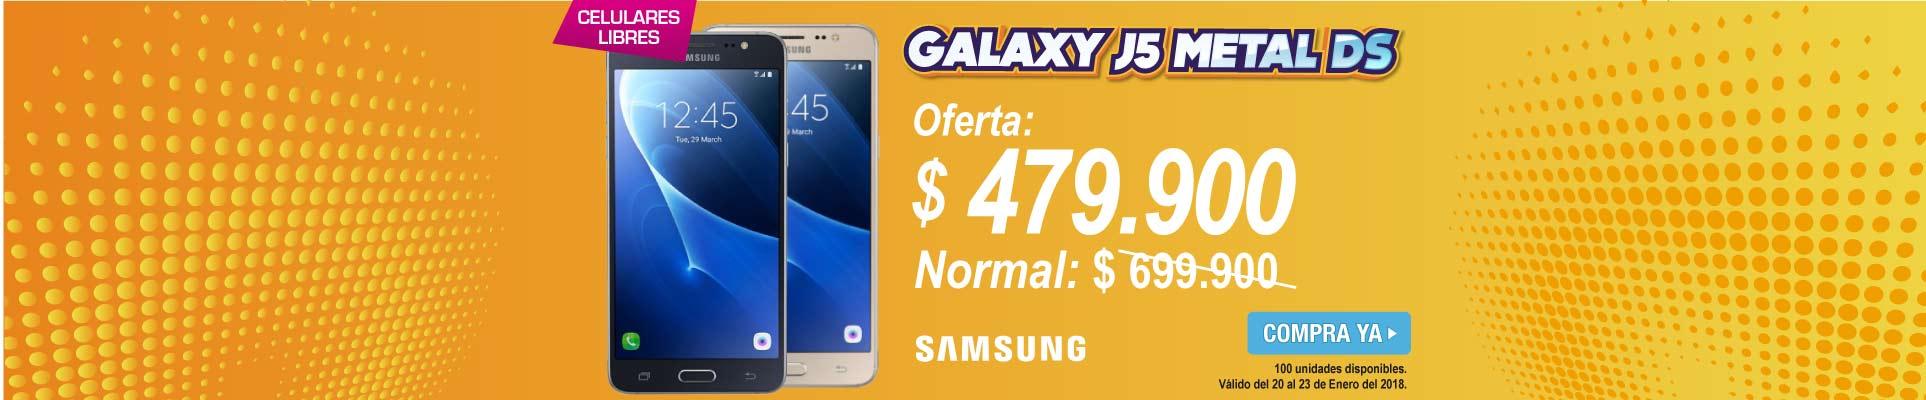 PPAL ALKP-1-celulares-Celular SAMSUNG Galaxy J5 Metal-prod-enero20-23